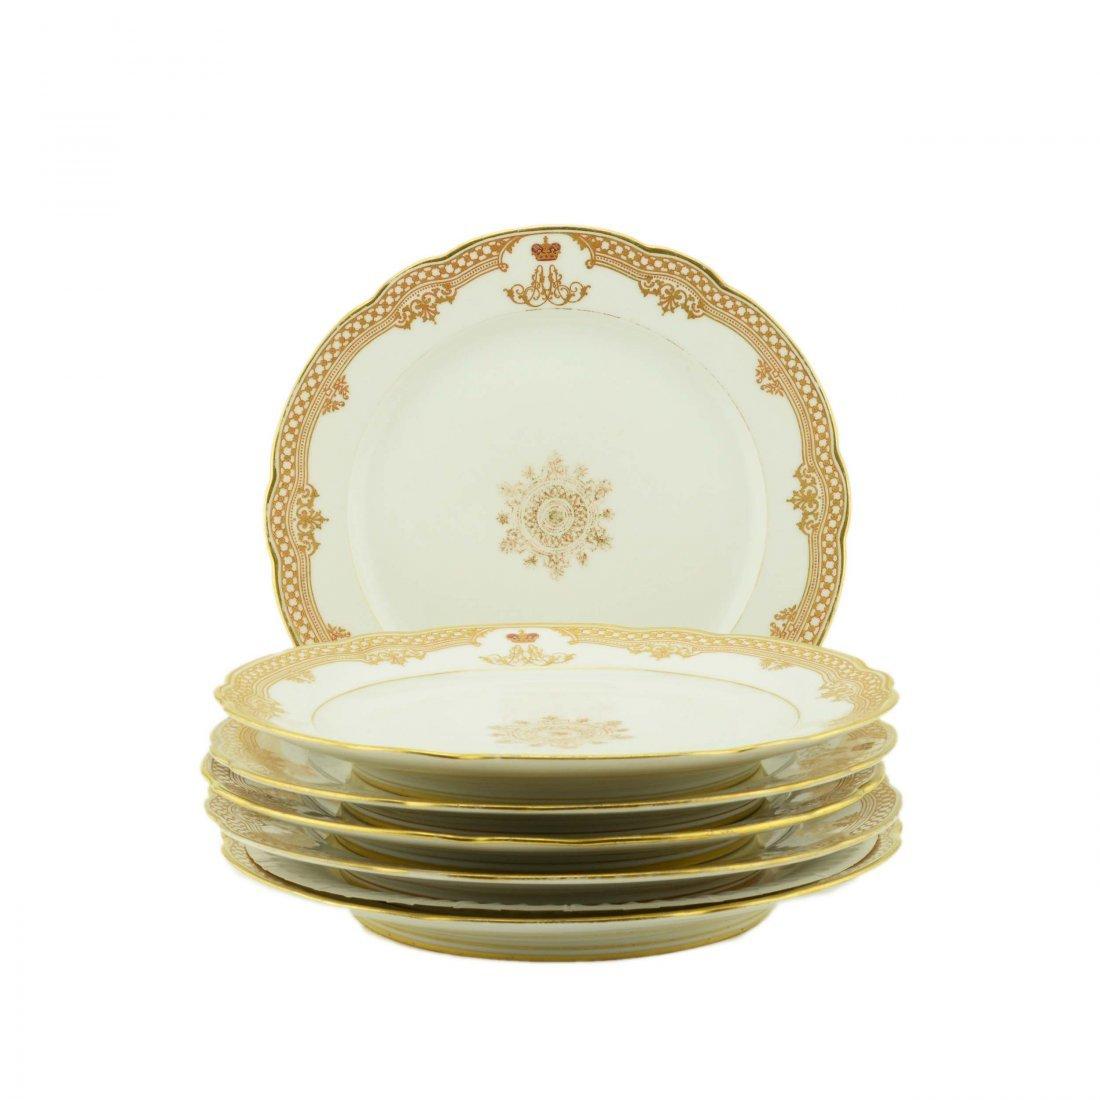 6 Grand Duke Alexander Alexandrovich Plates